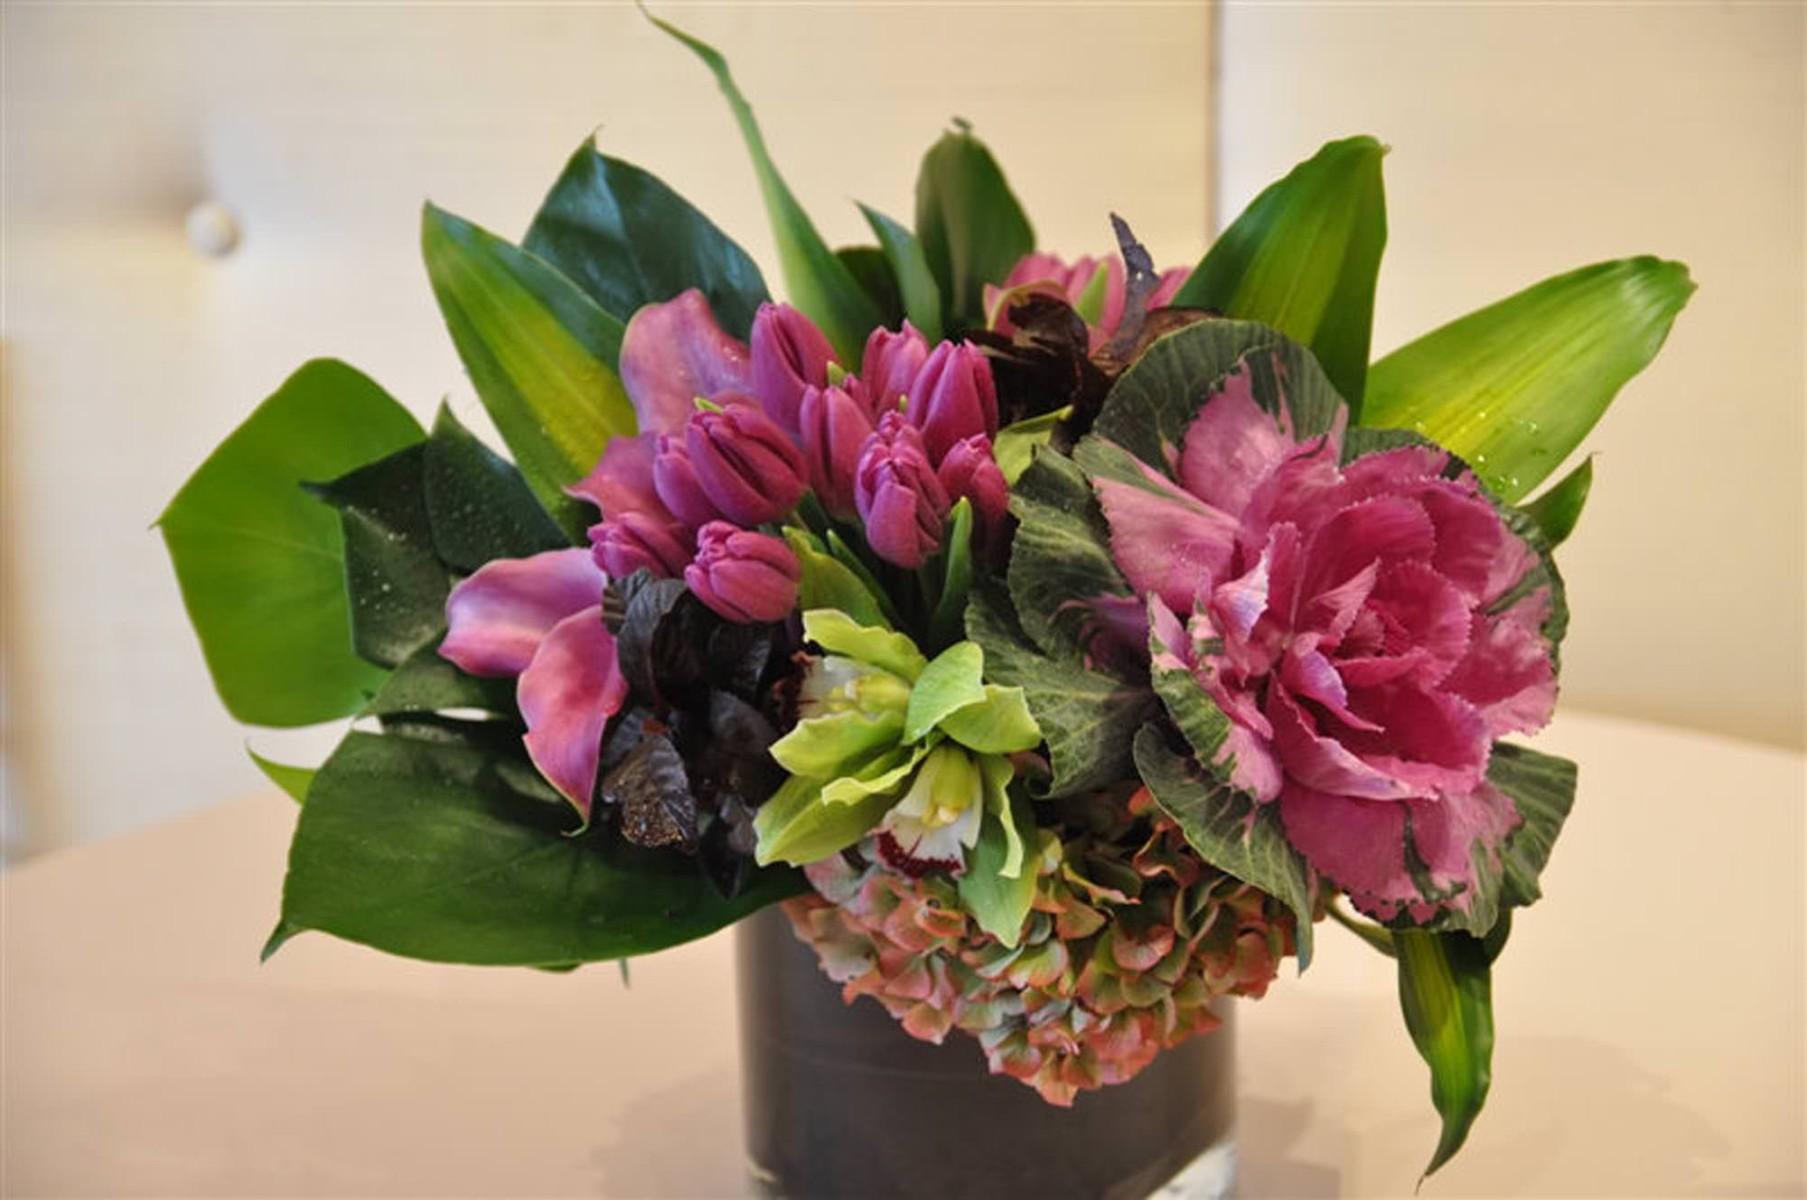 nisies-enchanted-florist-orange-county-floral-arrangments-15